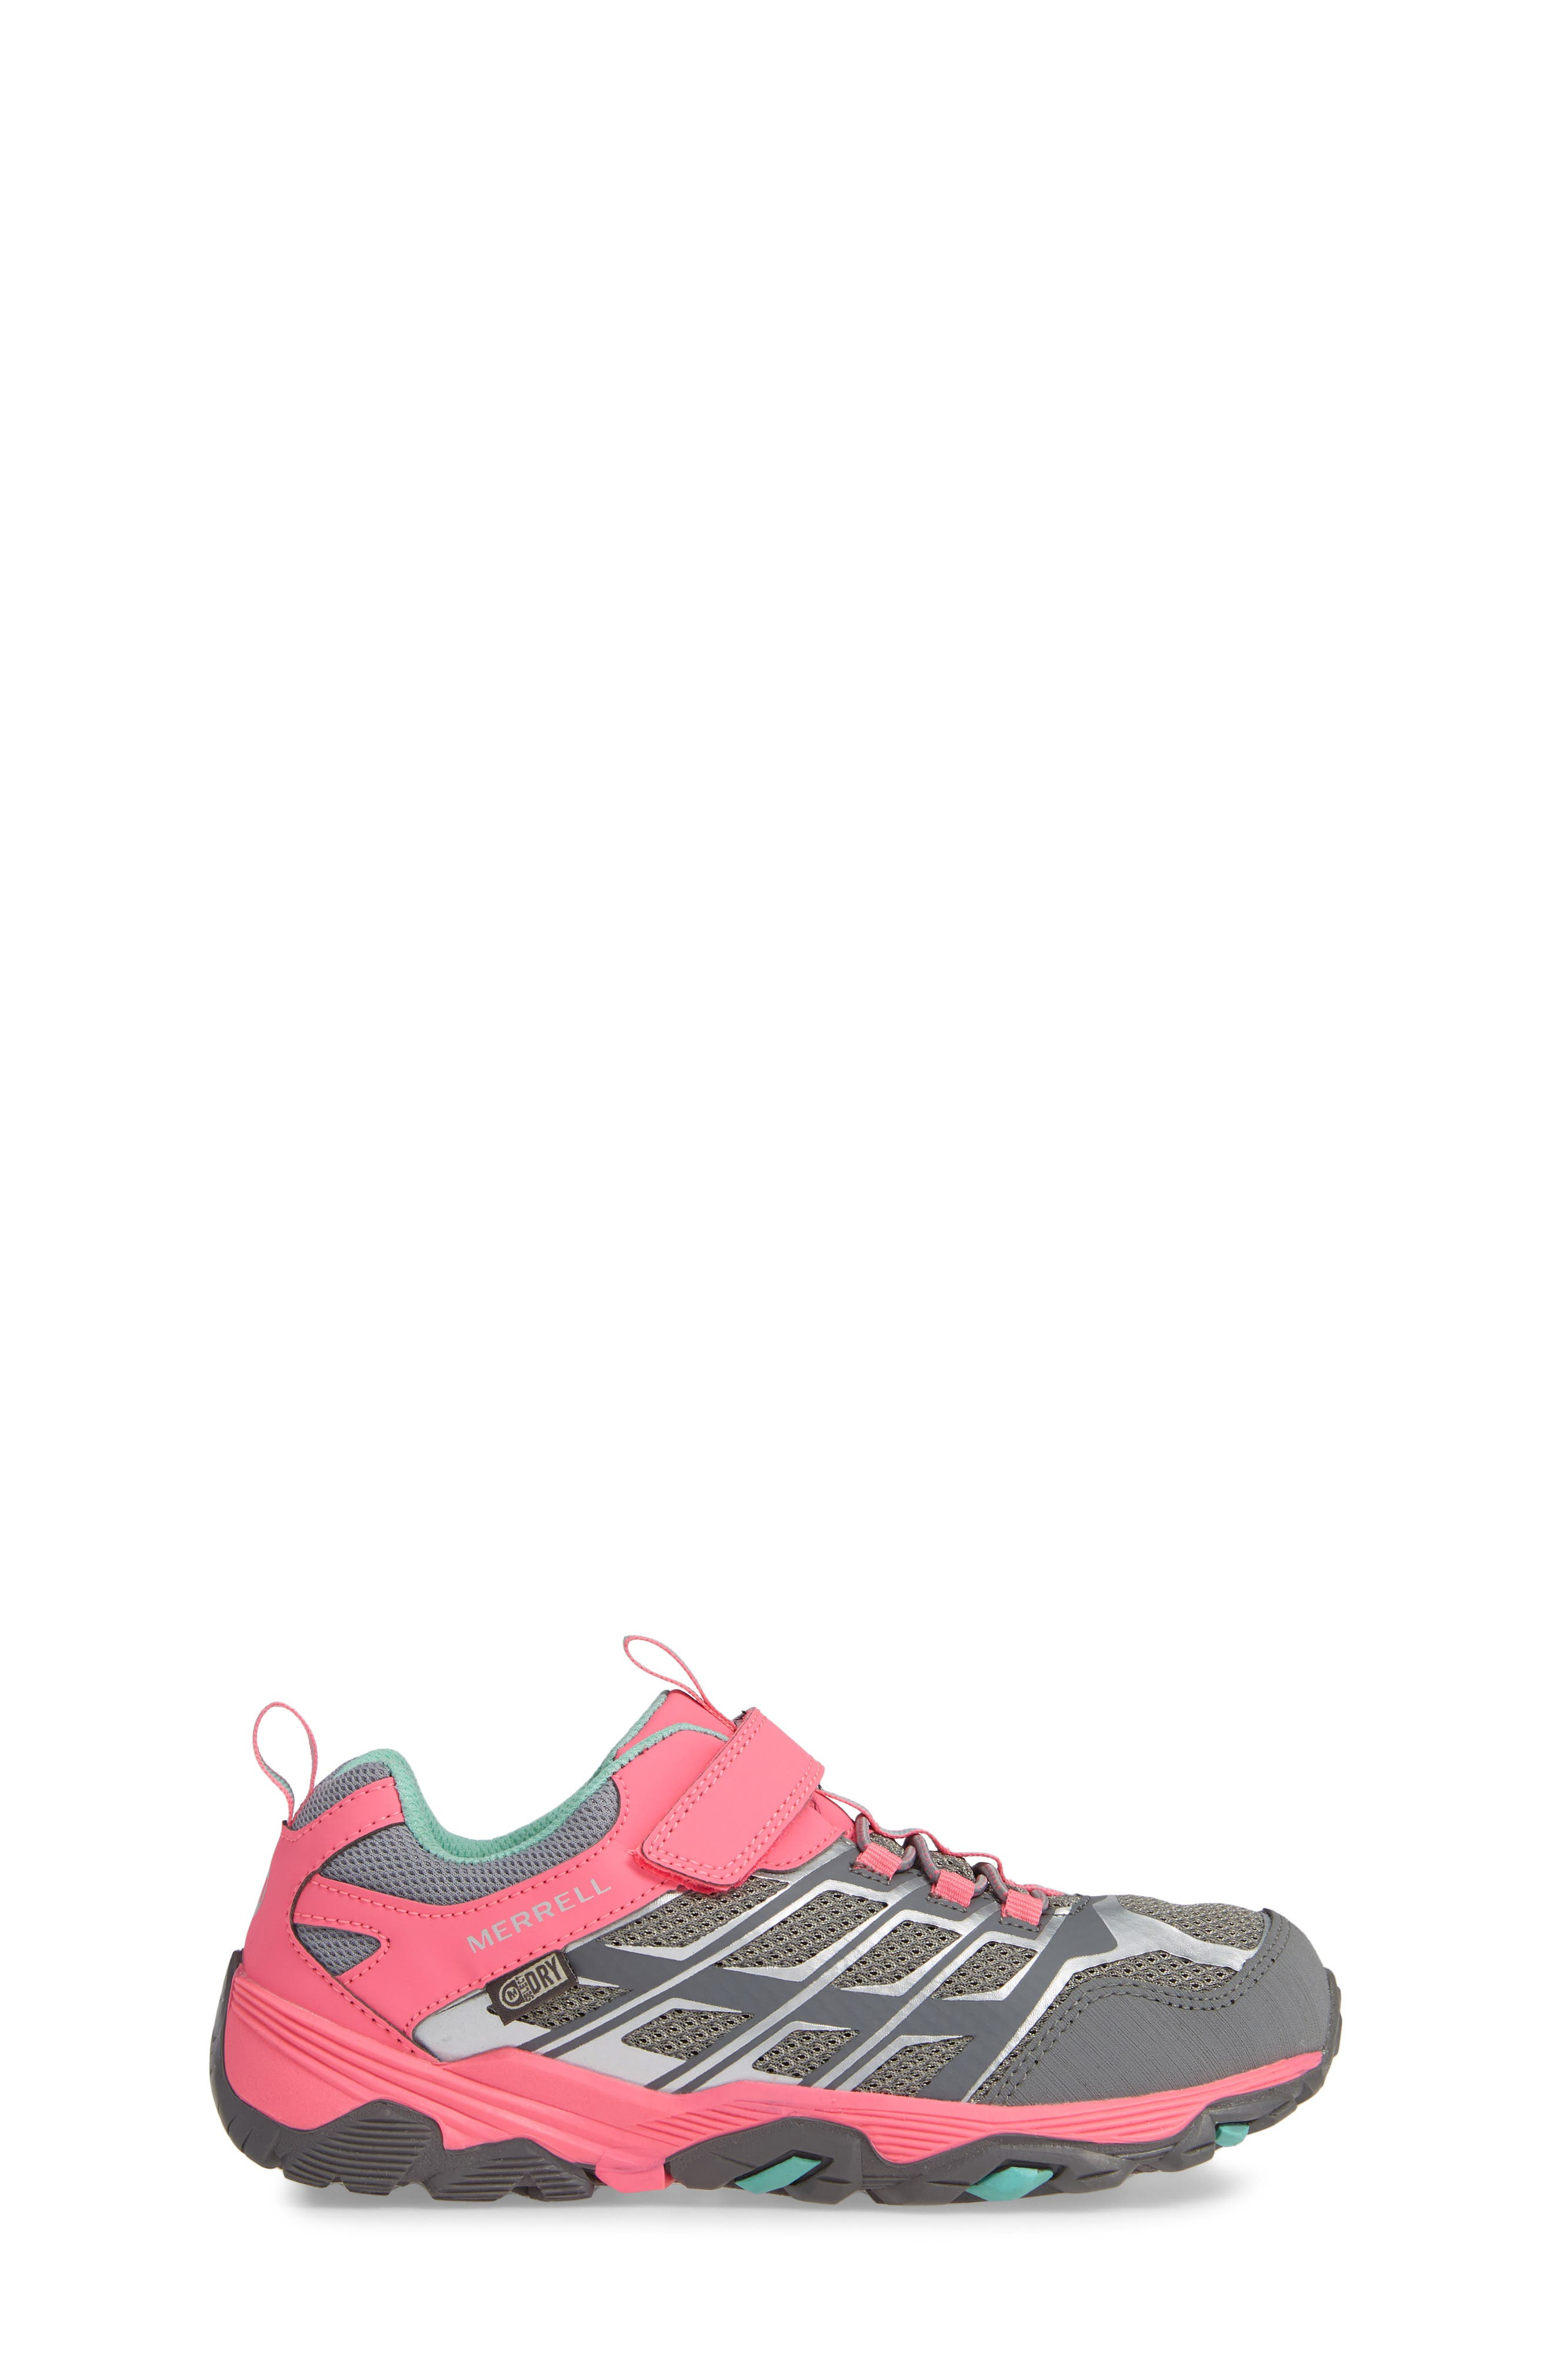 MERRELL, Moab FST Polar Low Waterproof Sneaker, Alternate thumbnail 3, color, GREY/ CORAL